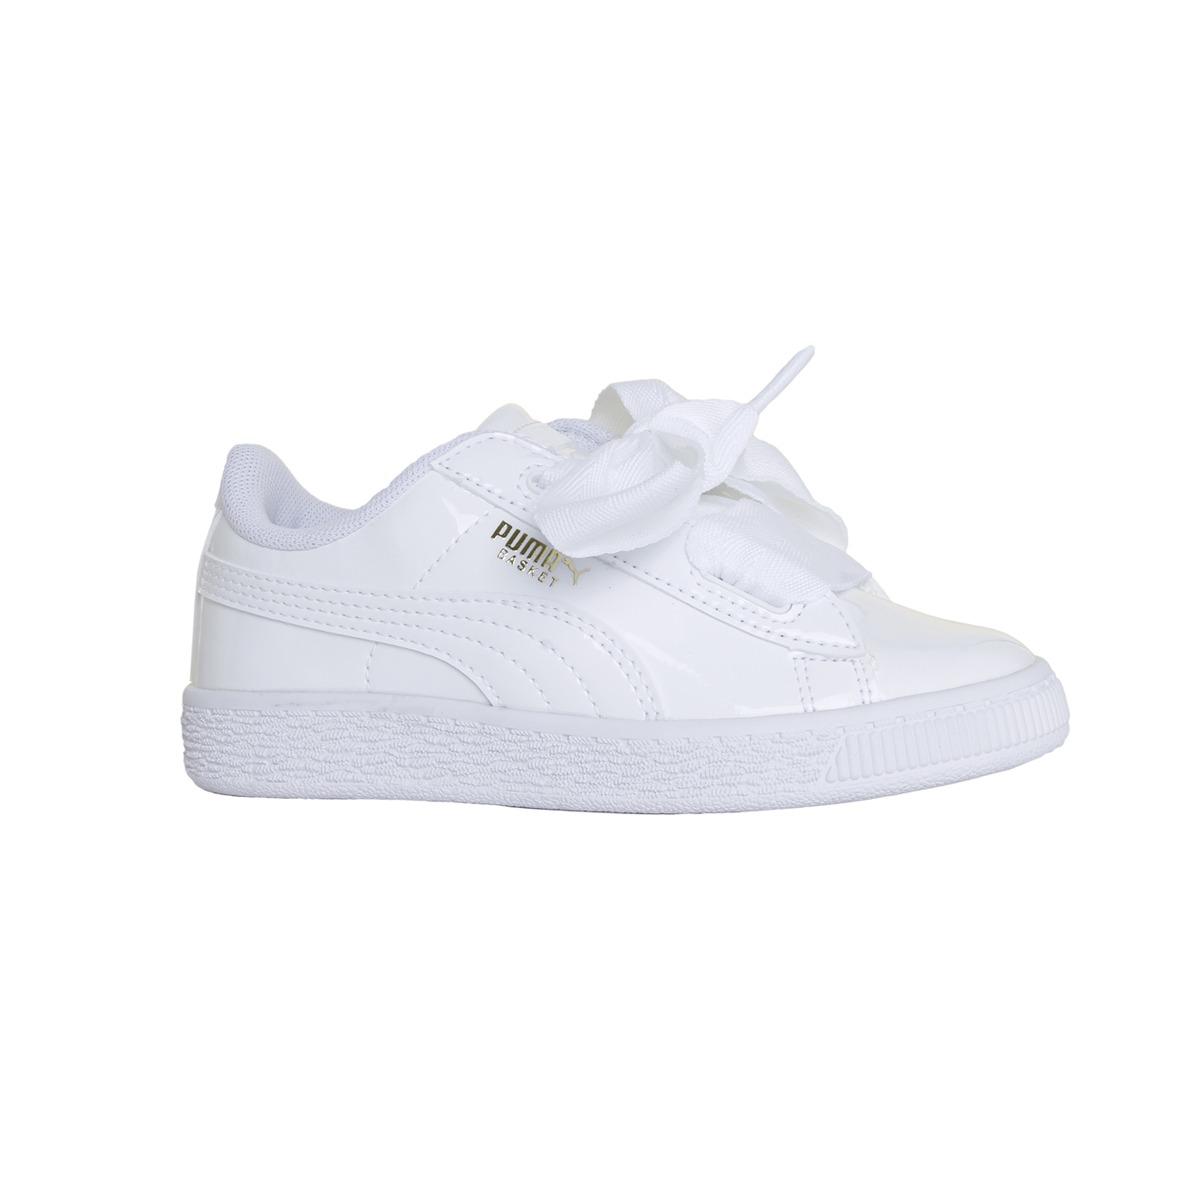 ea0c77601 zapatillas puma moda basket heart patent ps niña bl bl. Cargando zoom.